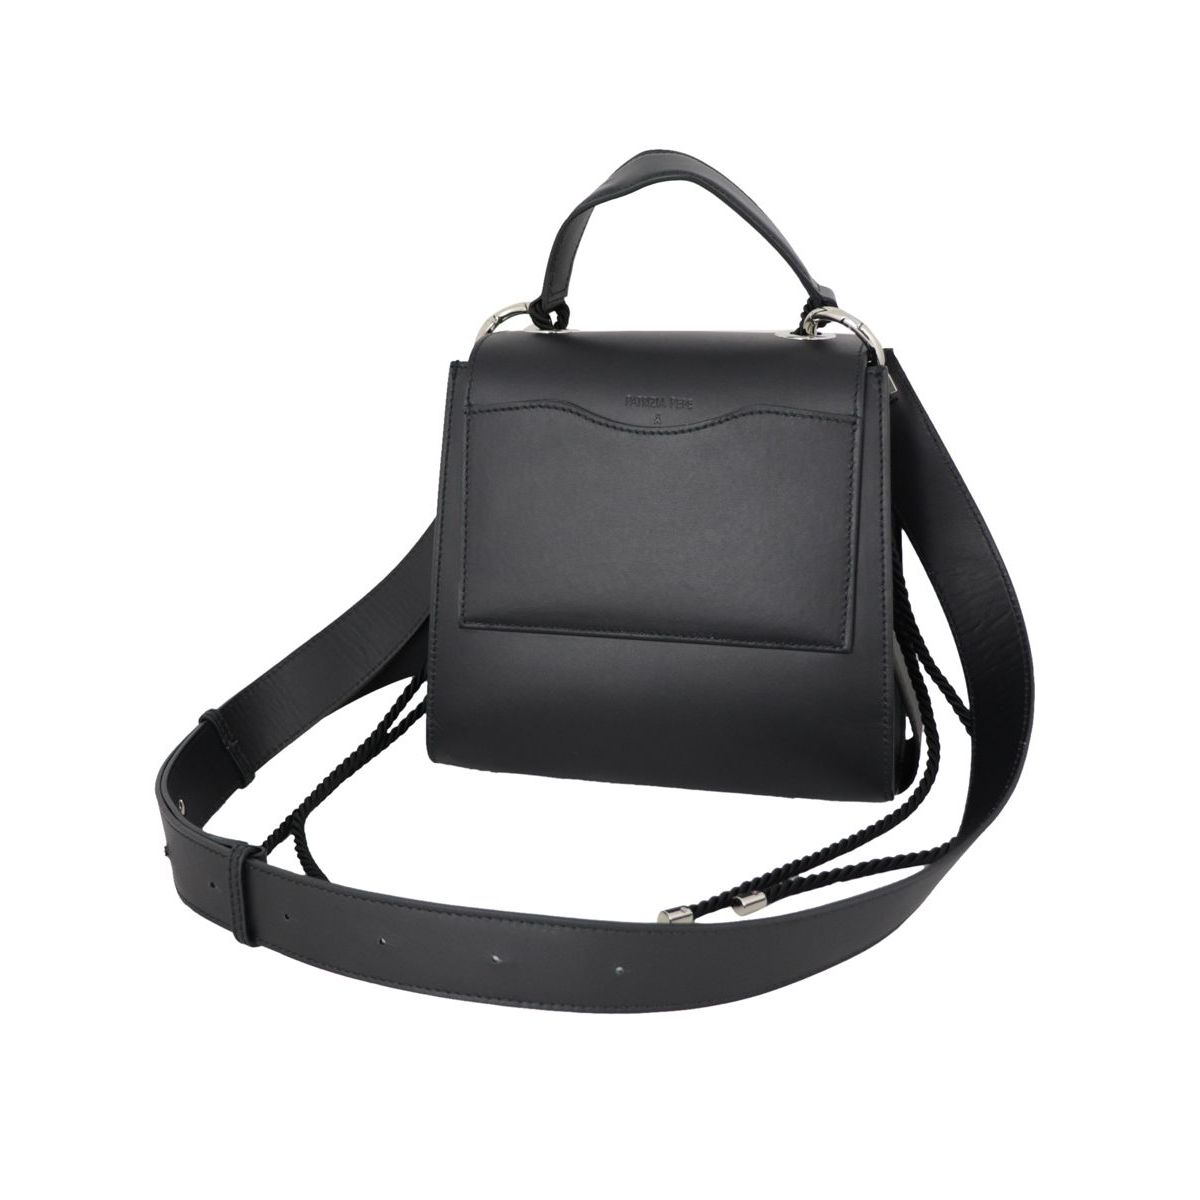 Leather handbag with cords Black Patrizia Pepe